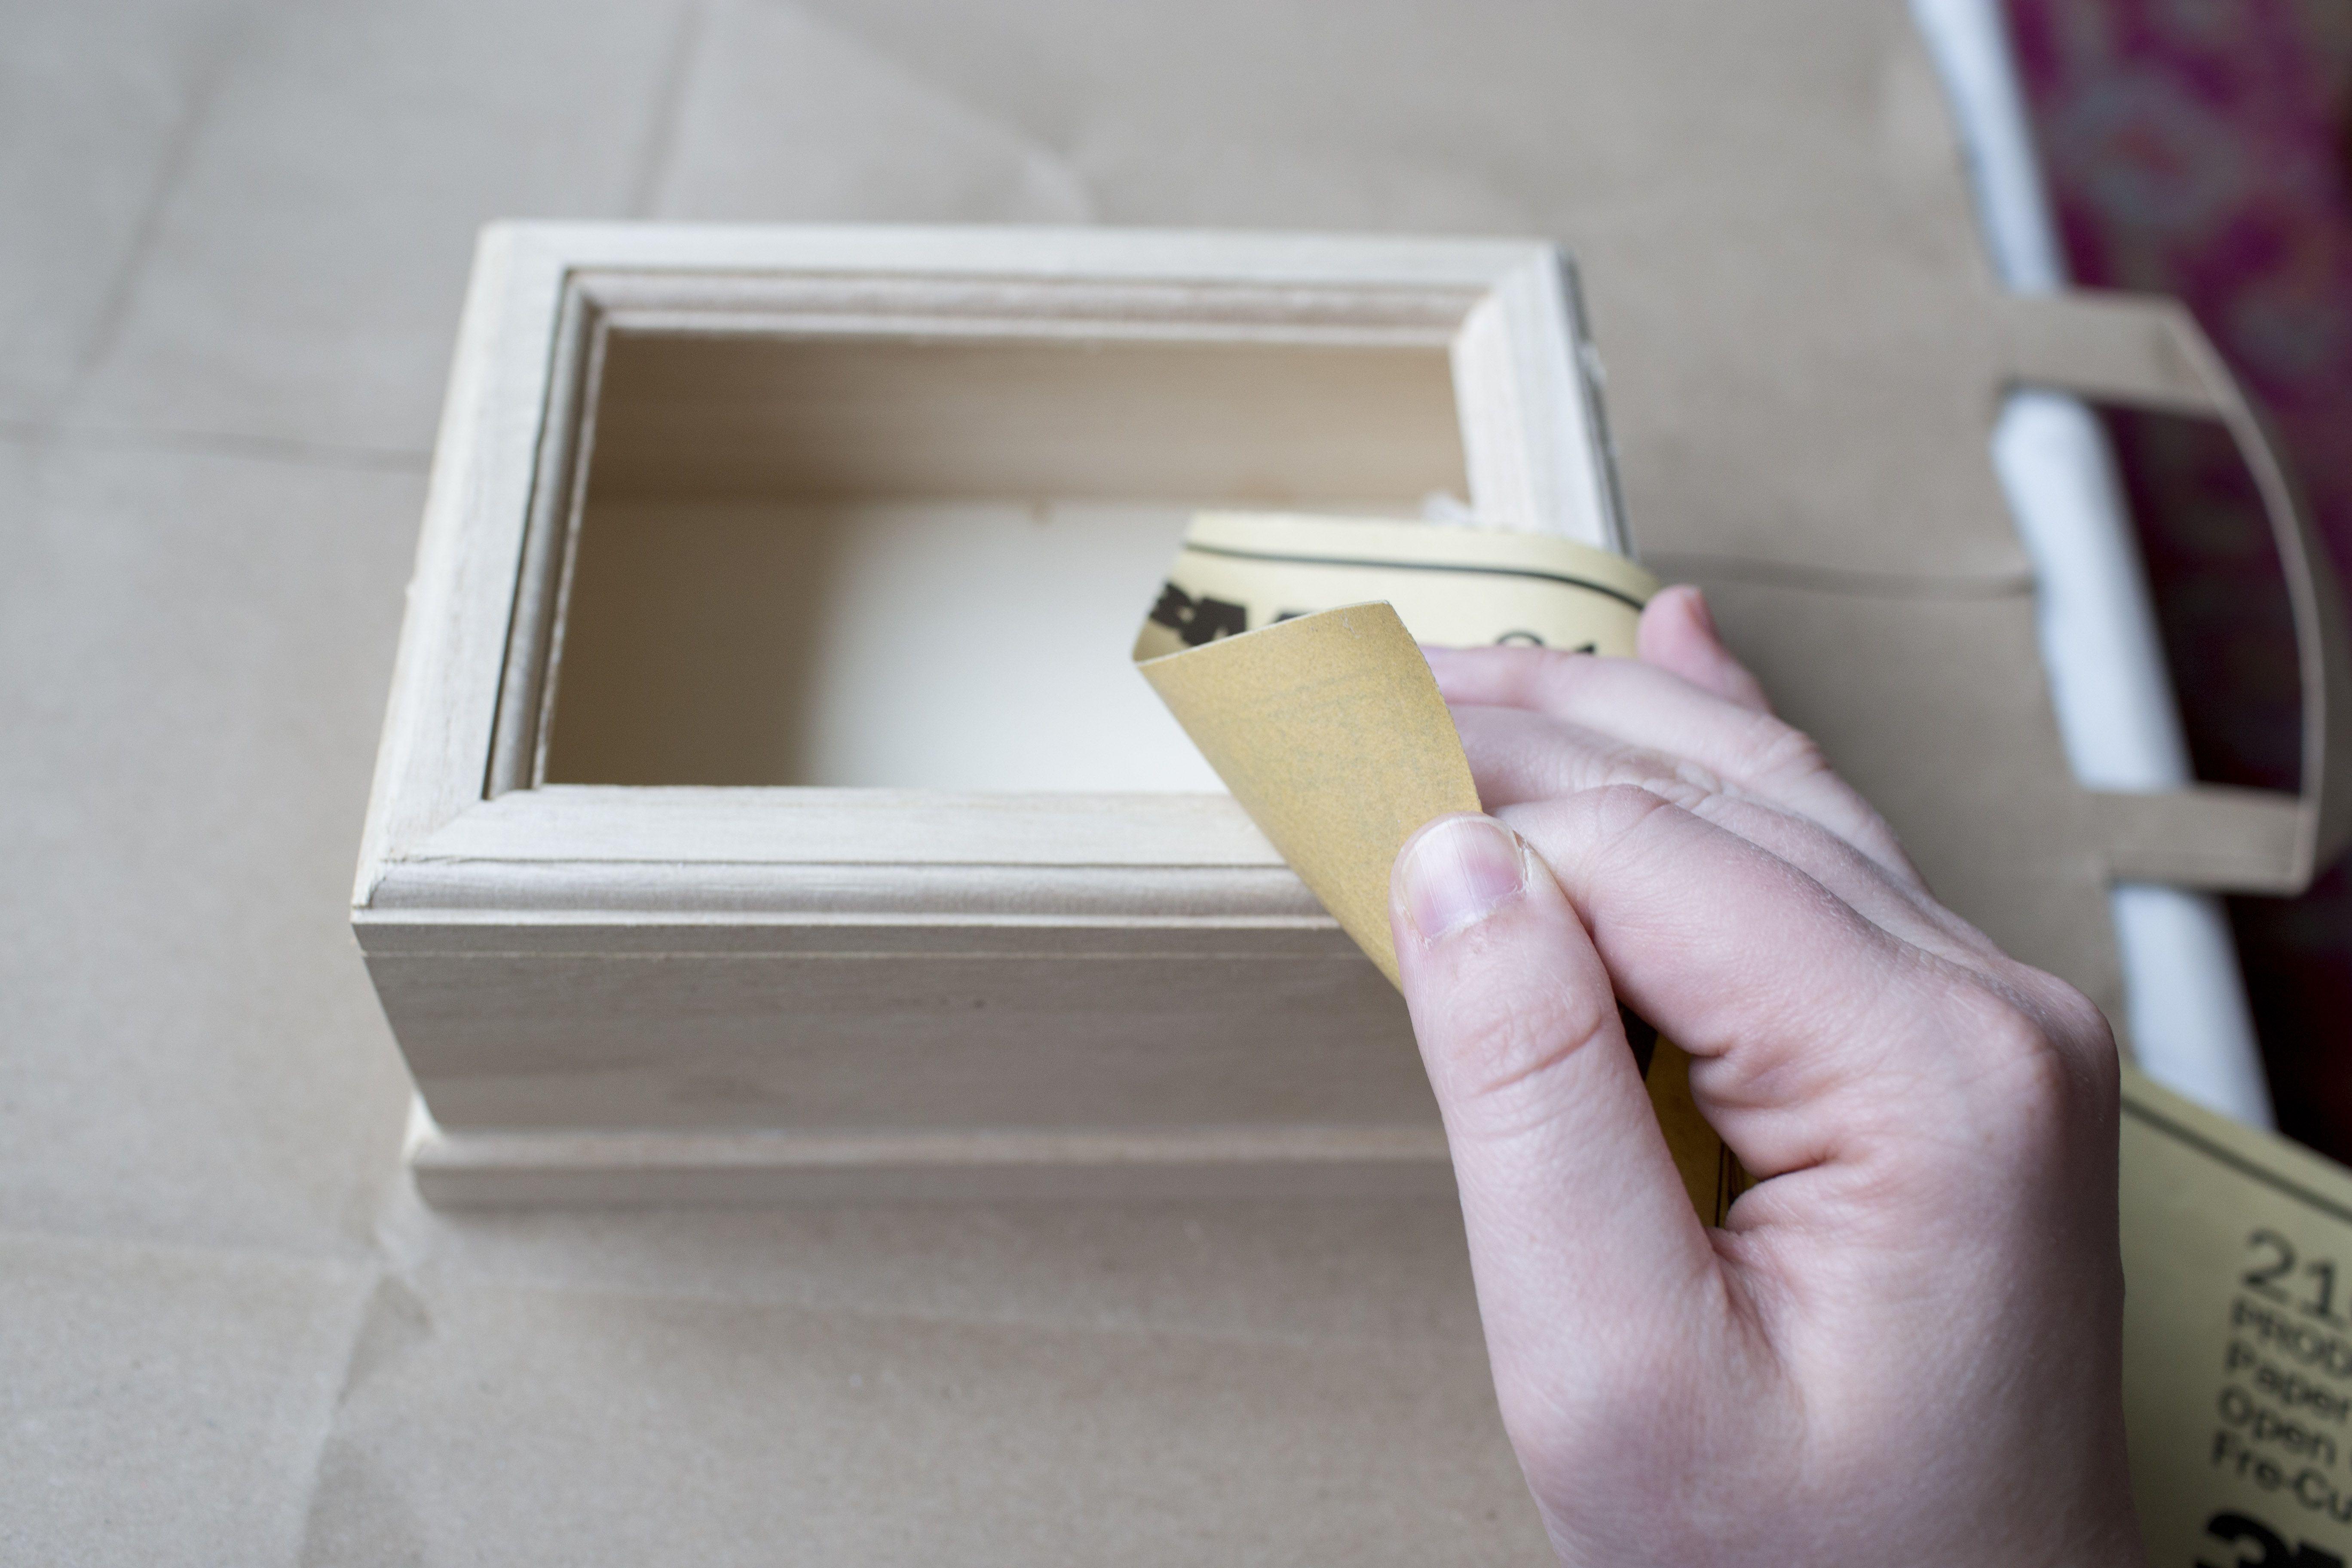 Sanding the jewelry box